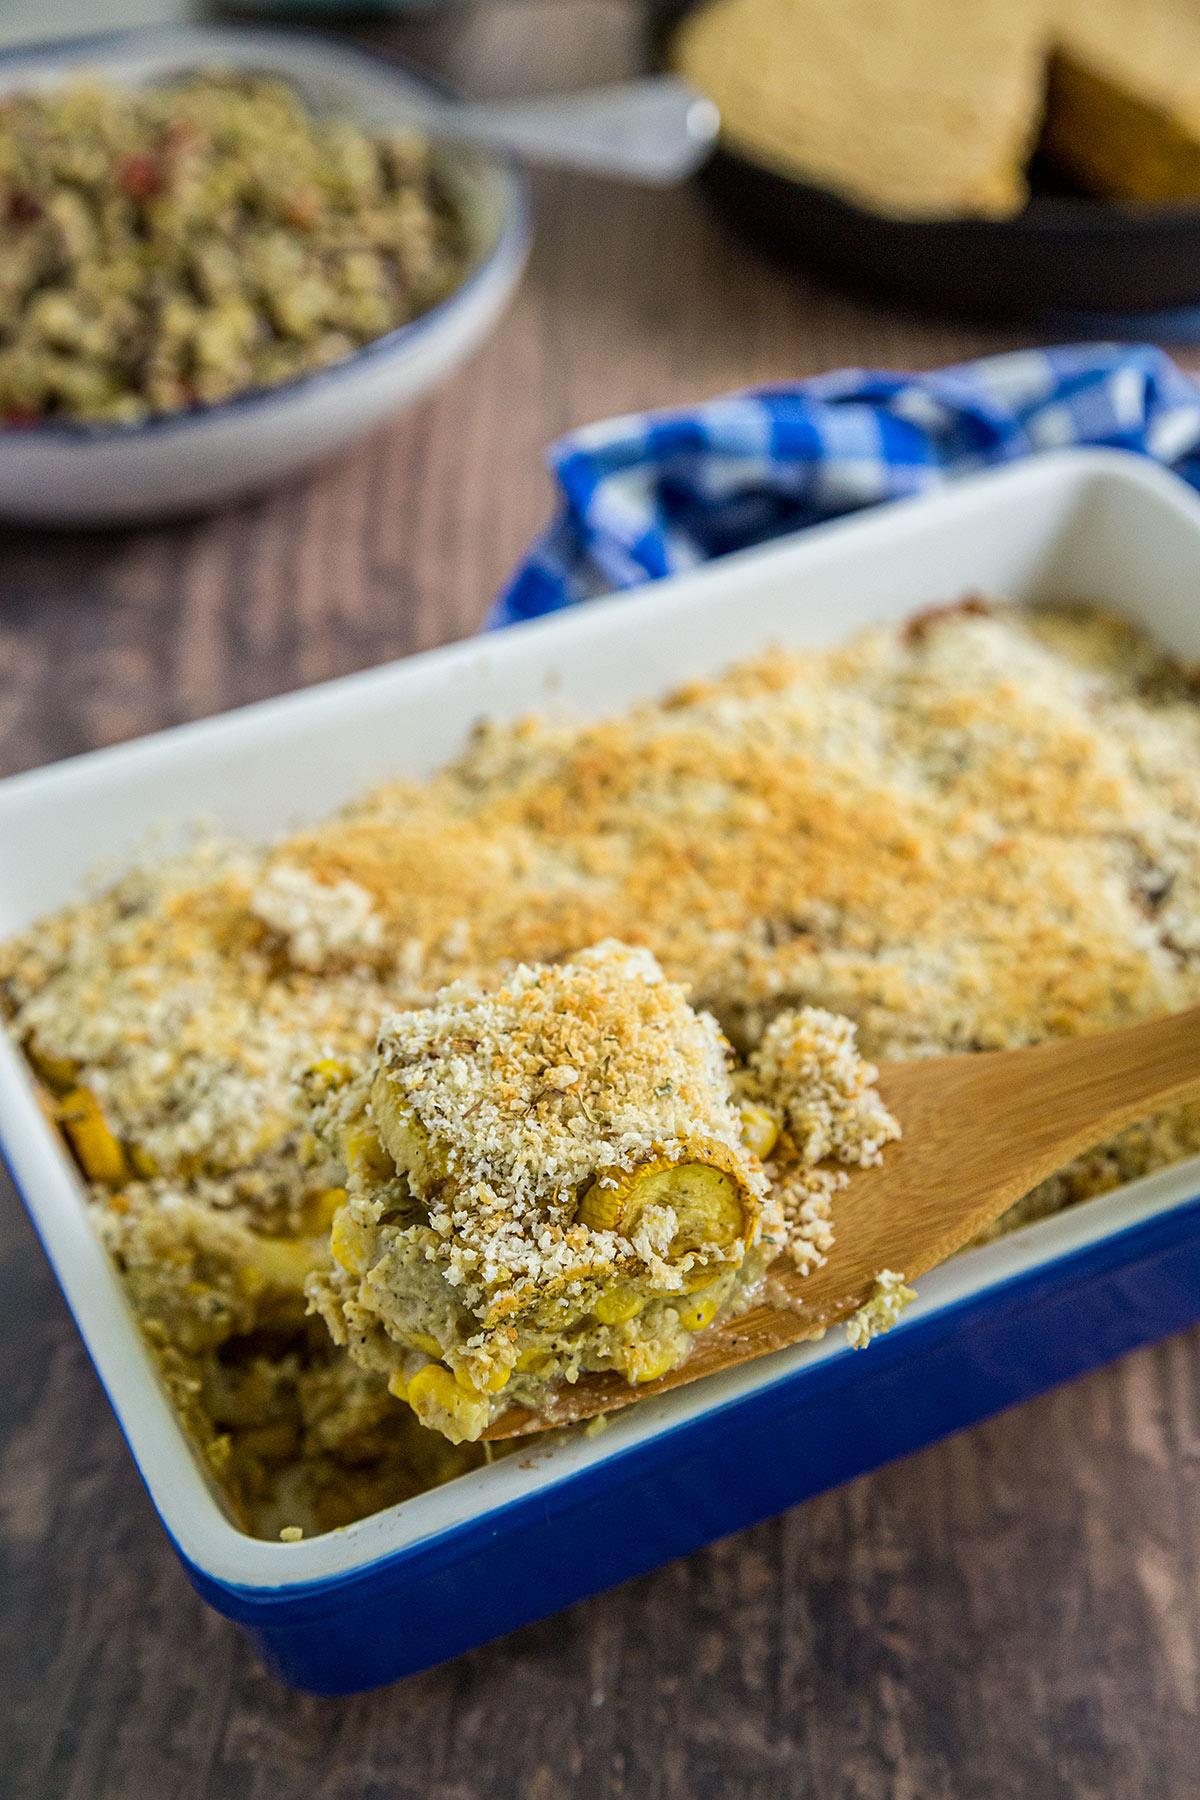 Vegan Yellow Squash and Corn Casserole in casserole dish